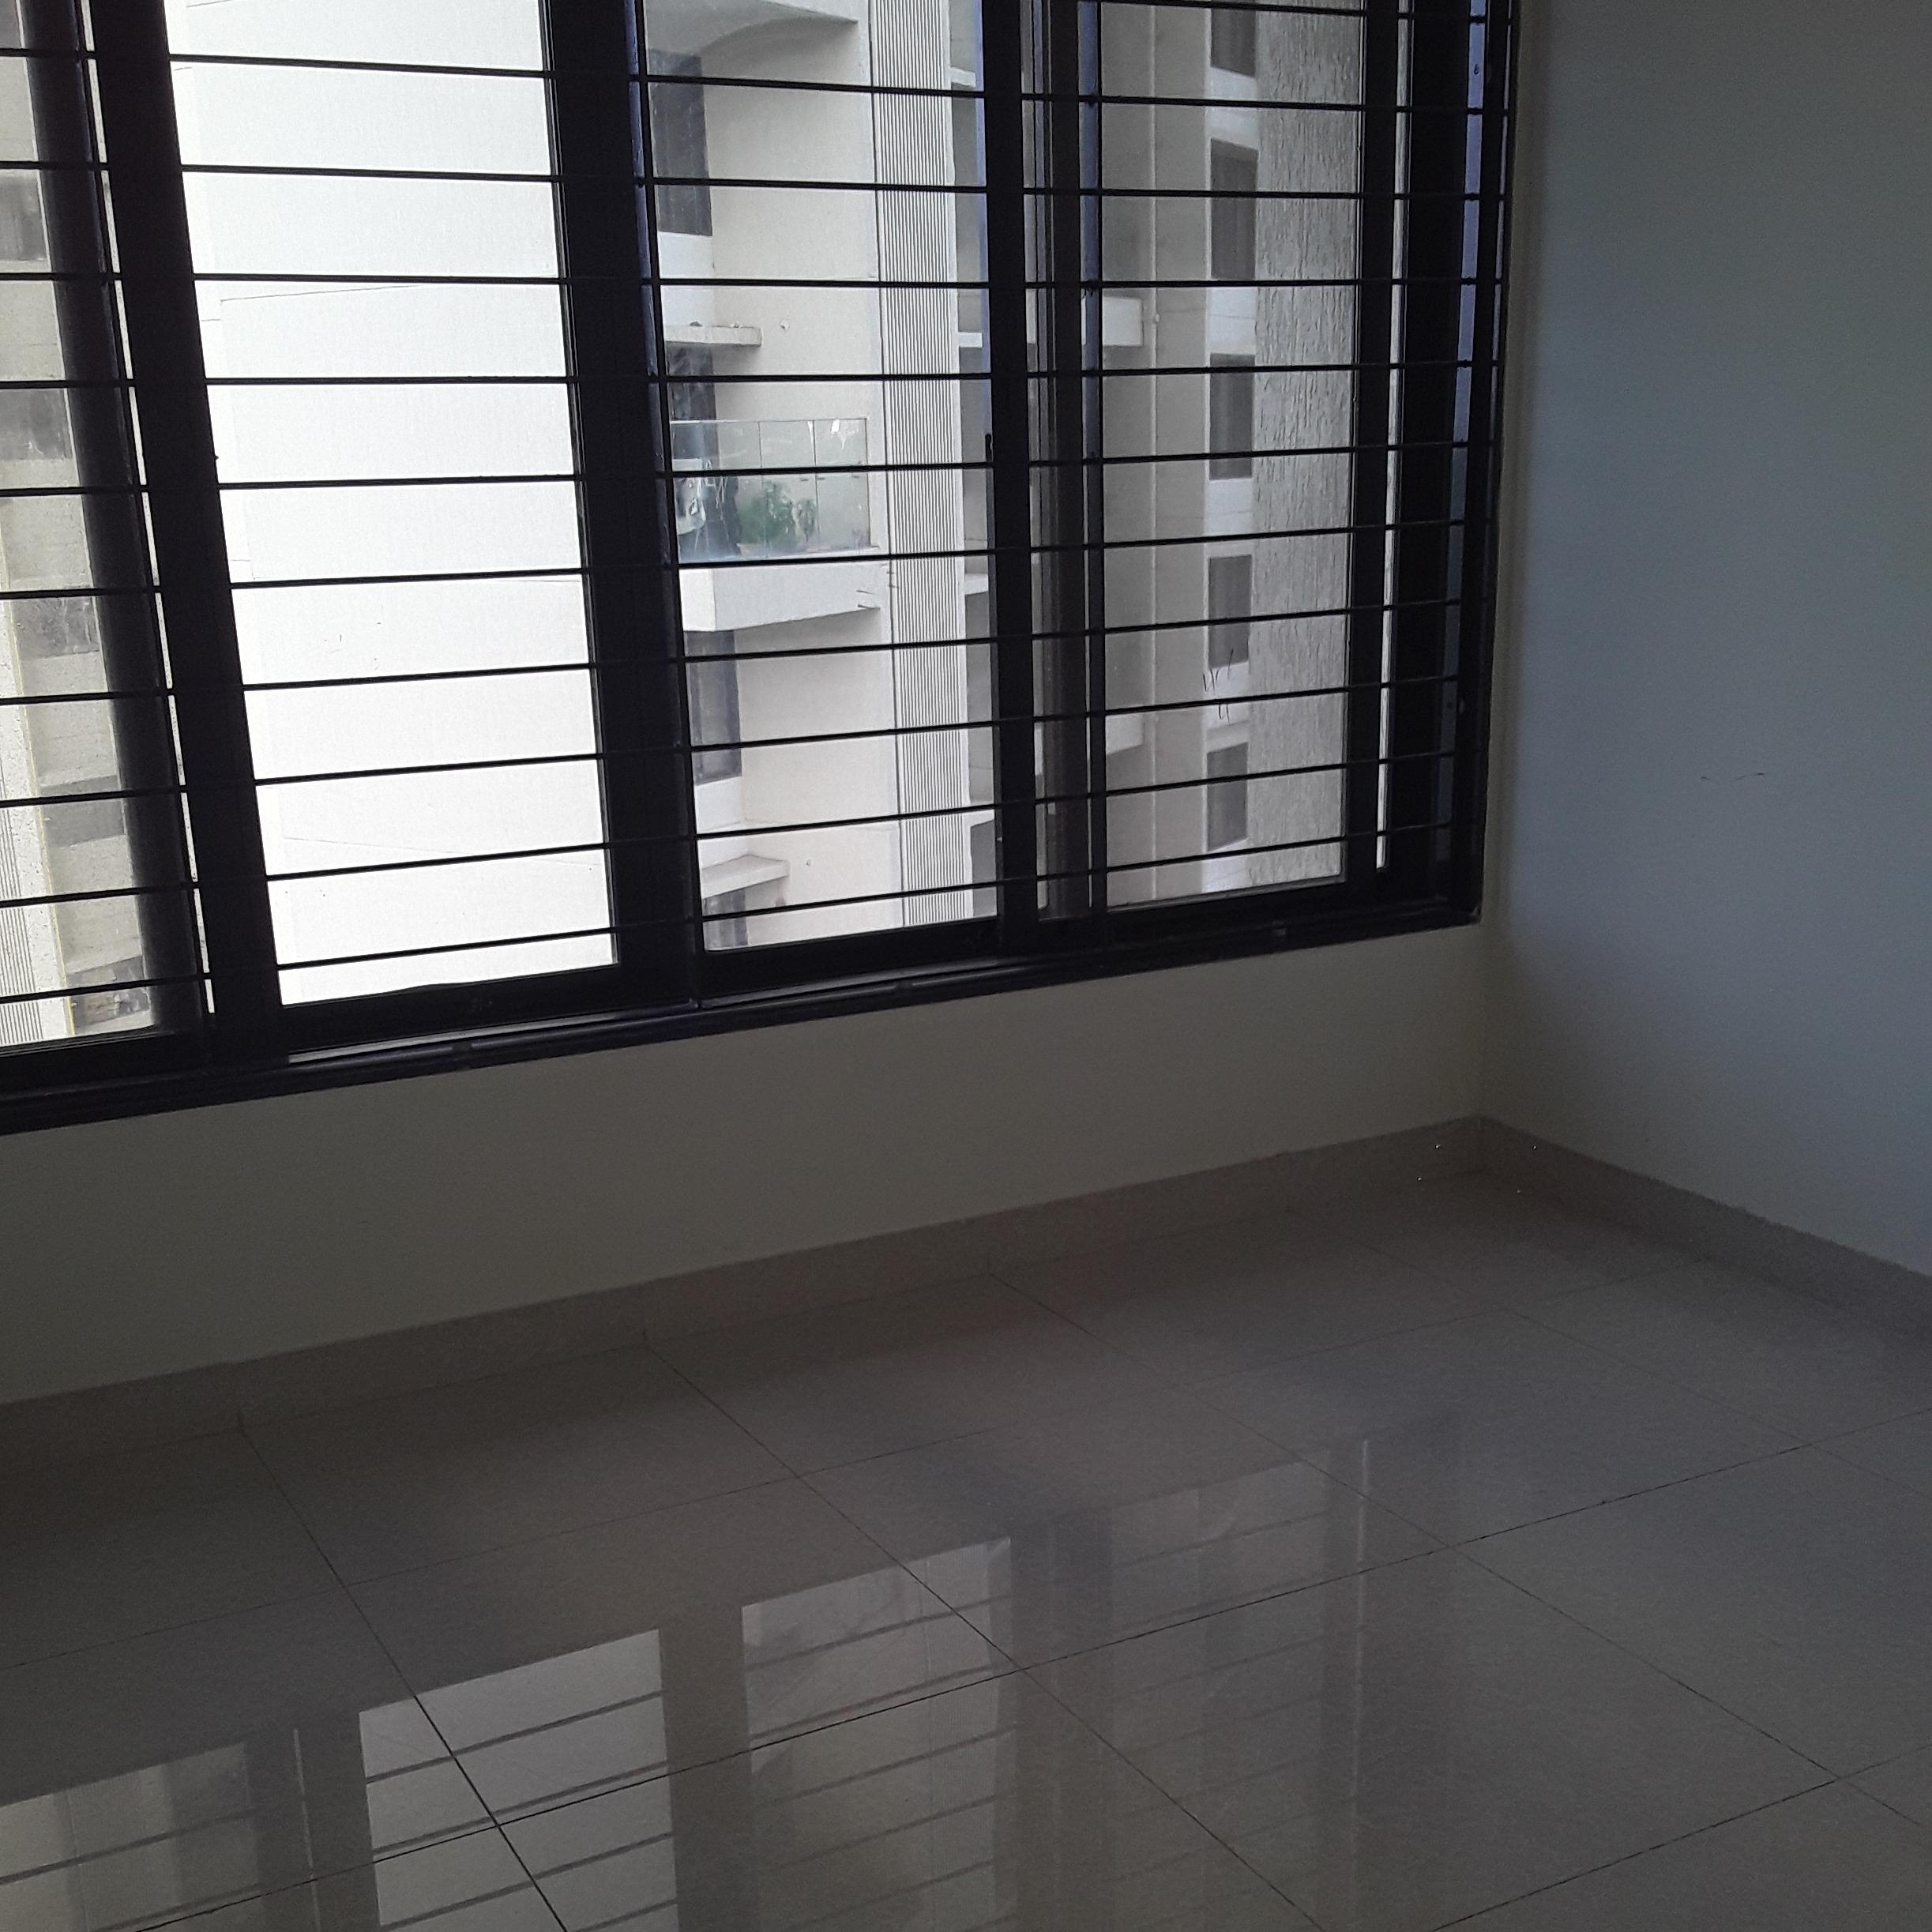 2.5 BHK 1210 Sq.Ft. Apartment in Magarpatta Nanded City Sargam